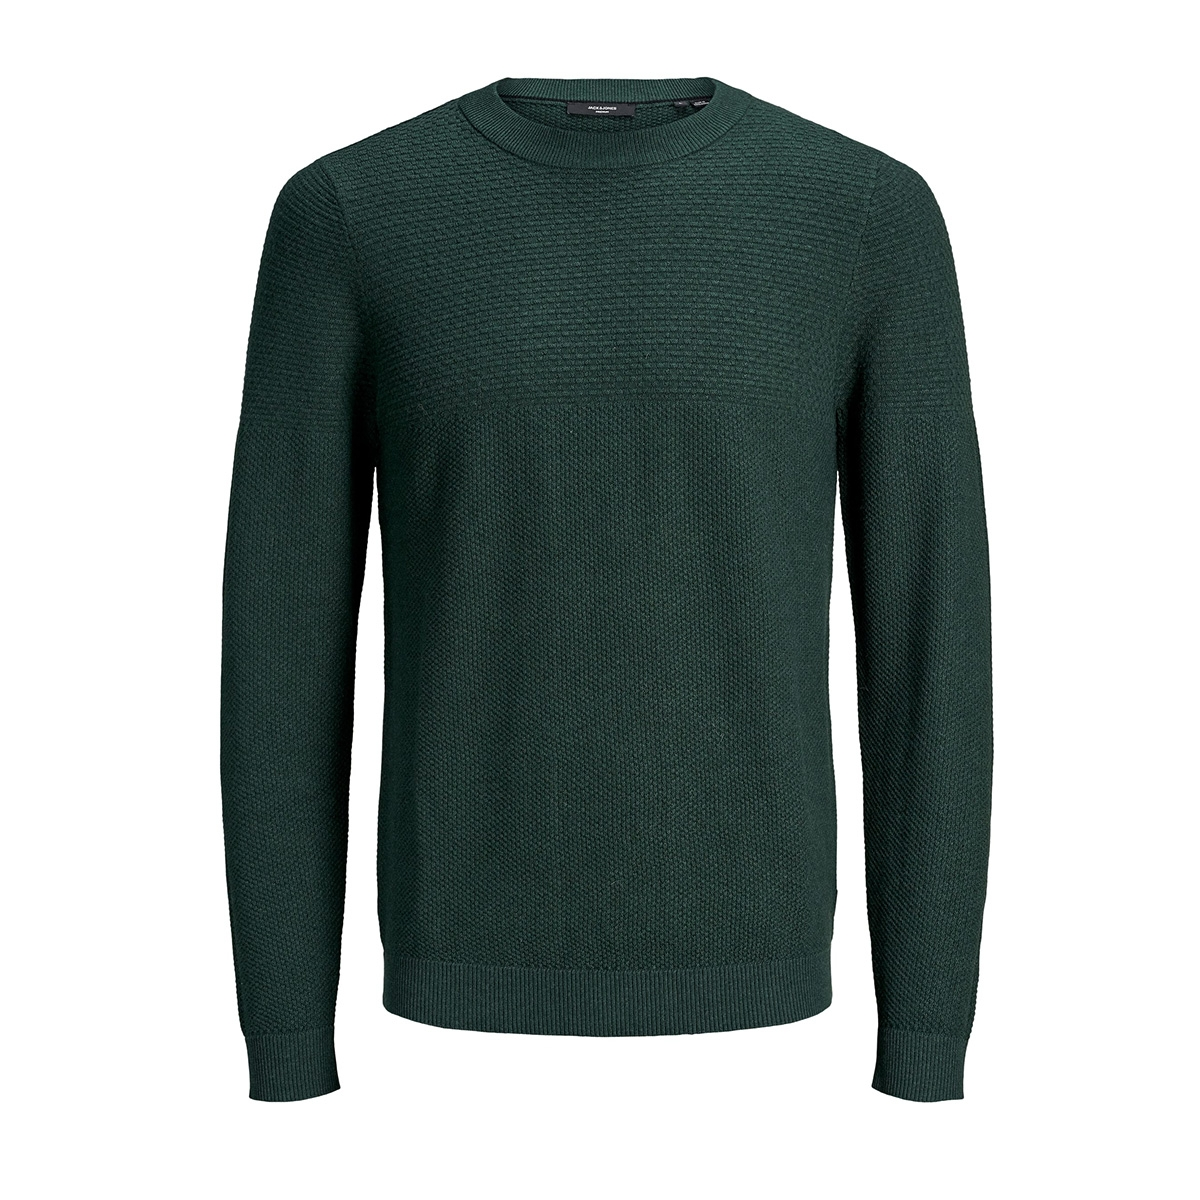 jprfast structure knit crew neck 12163172 jack & jones trui darkest spruce/melange